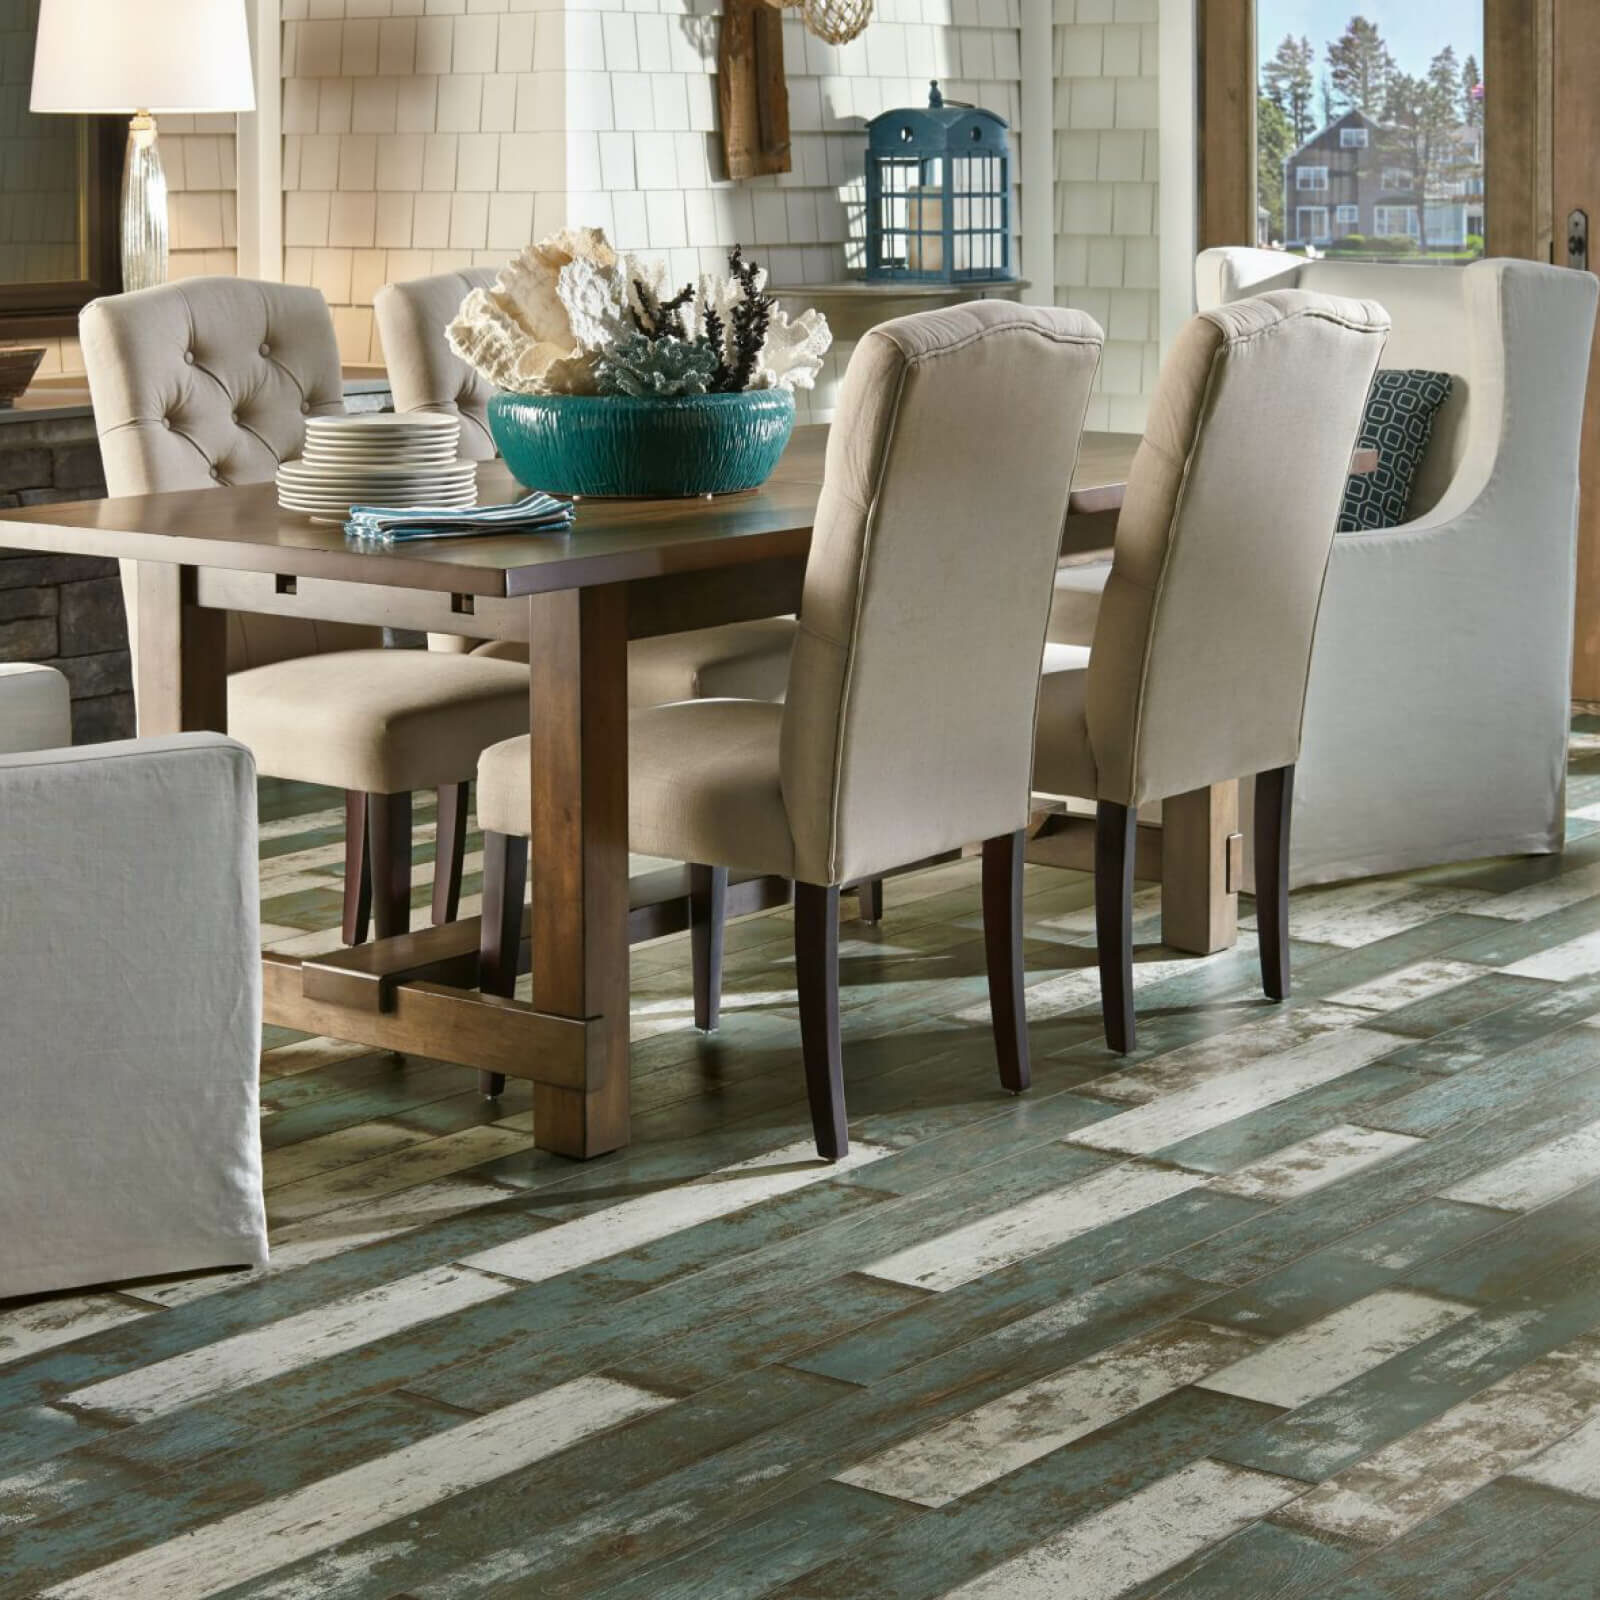 Small dining table on laminate floor | Flooring 101